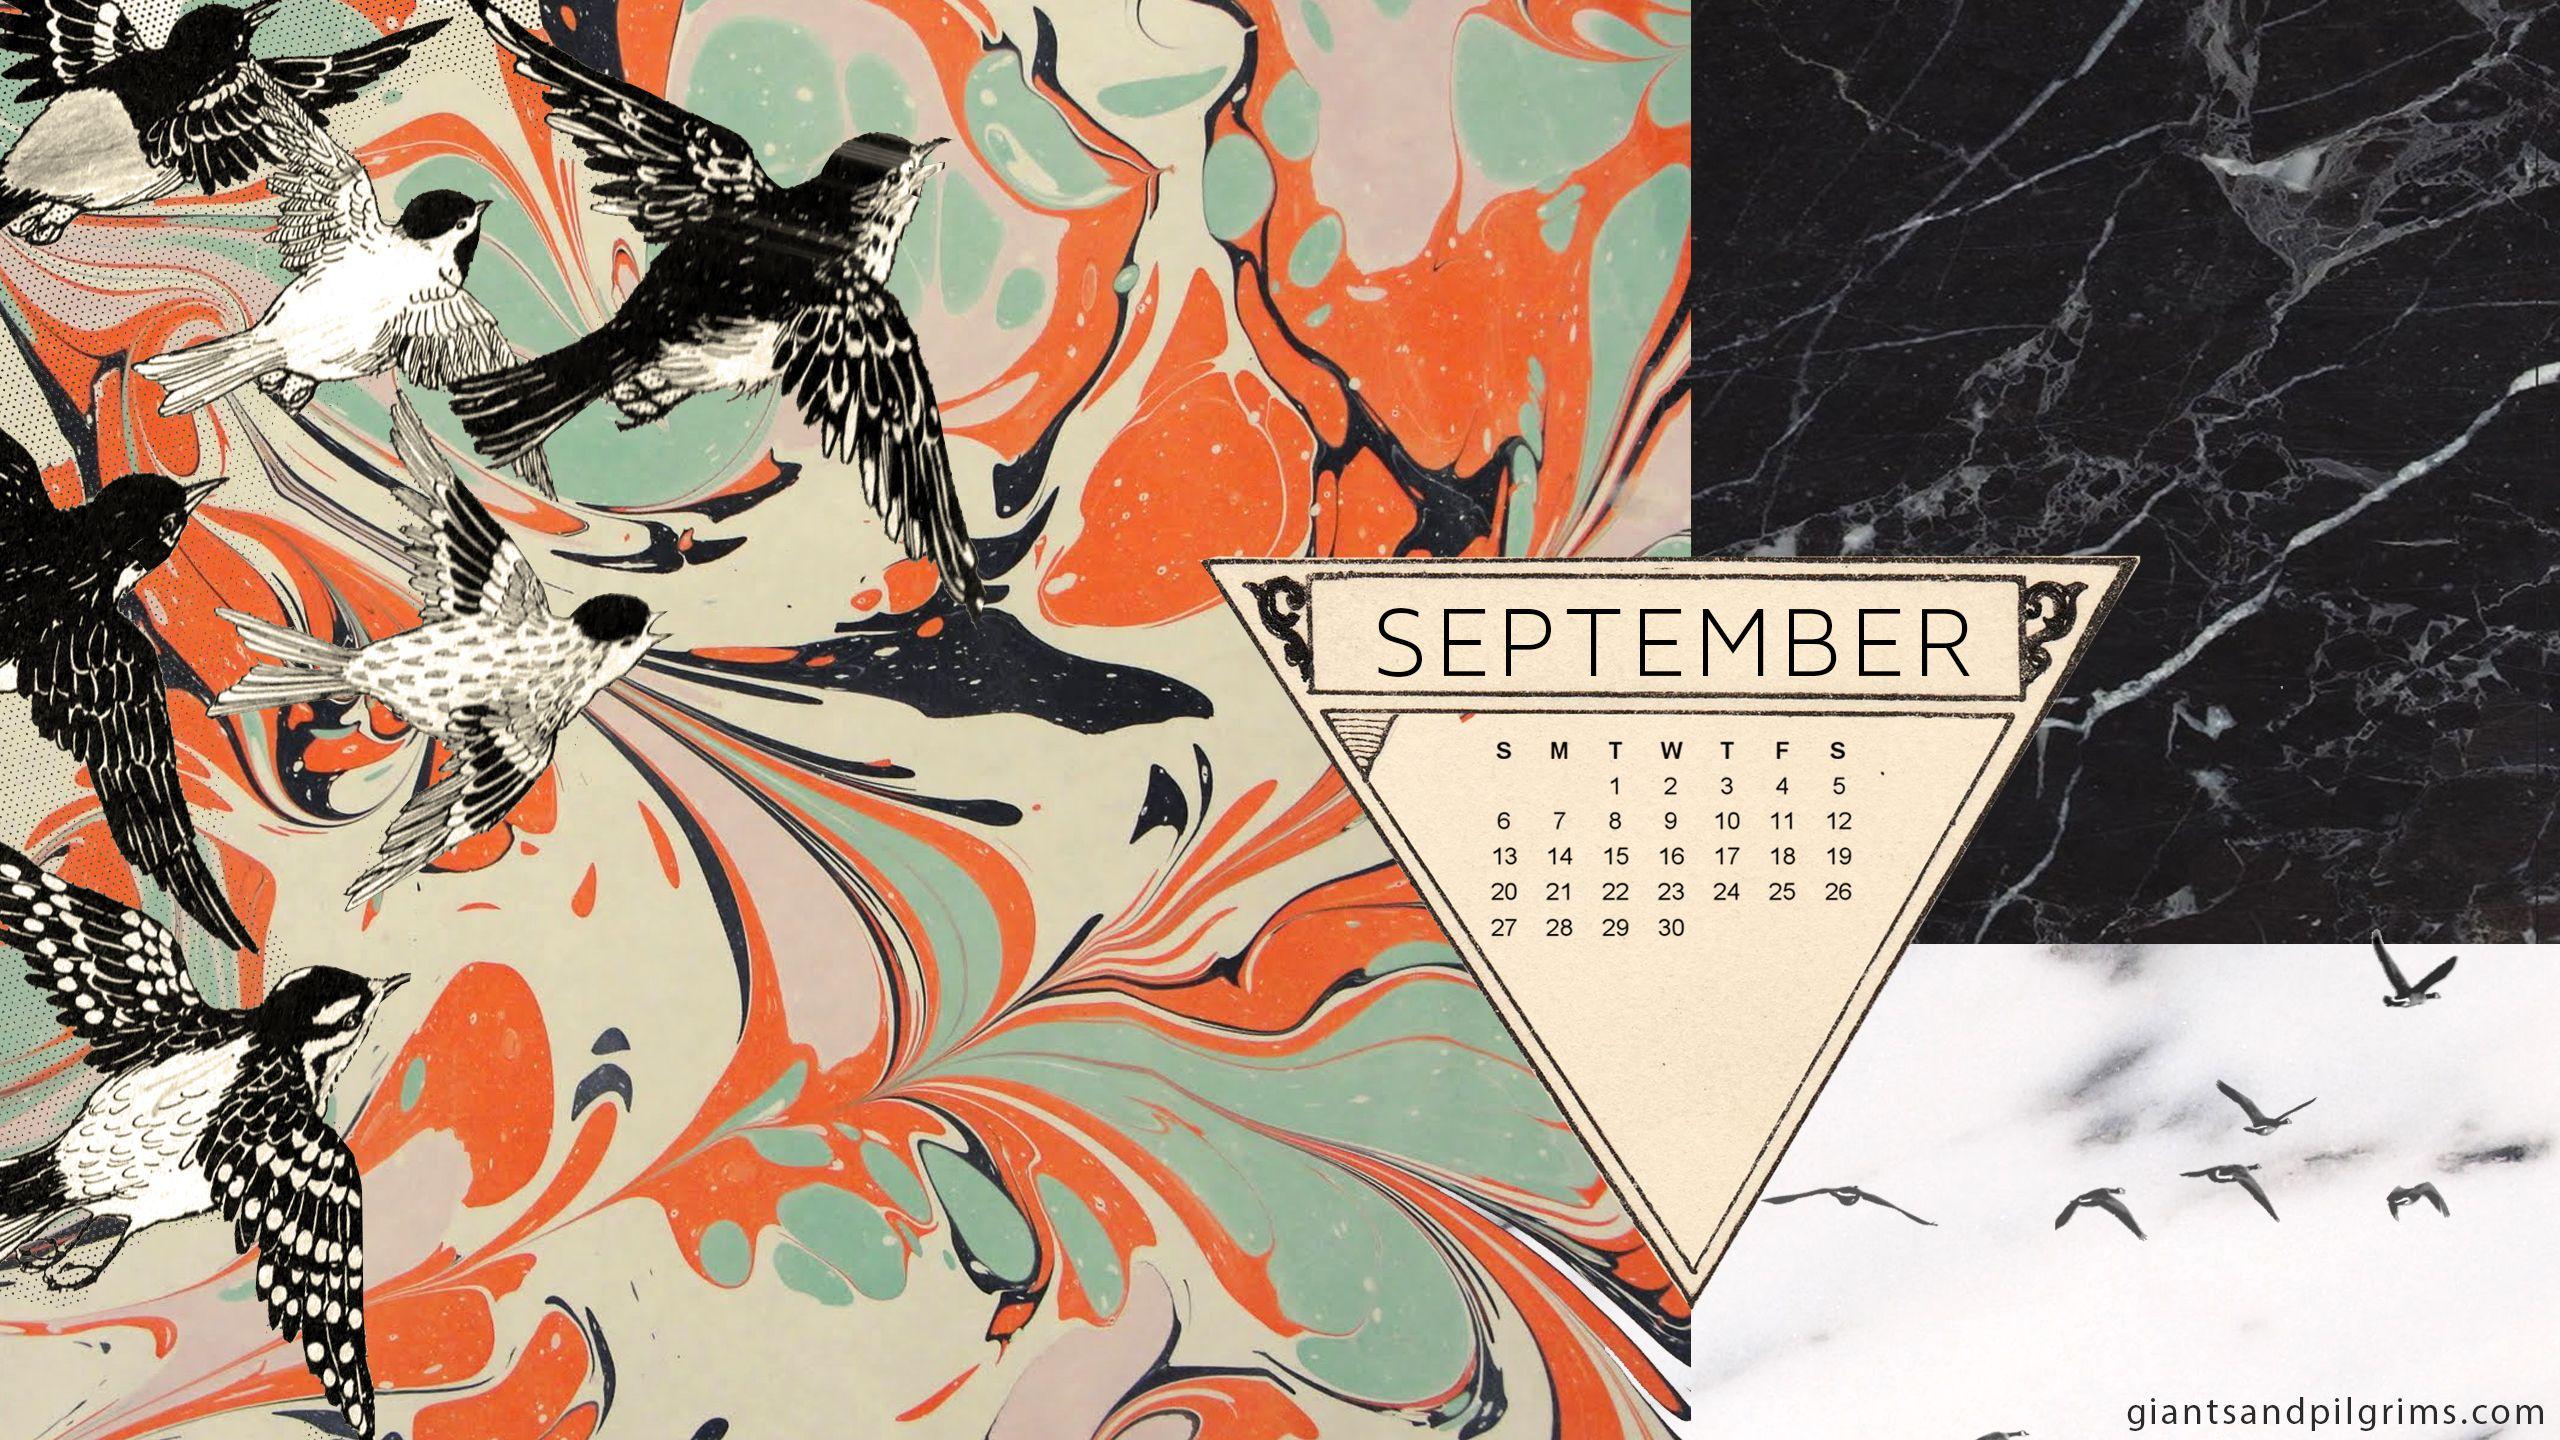 2560x1440 <b>September</b> desktop PC and Mac <b>wallpaper</b>